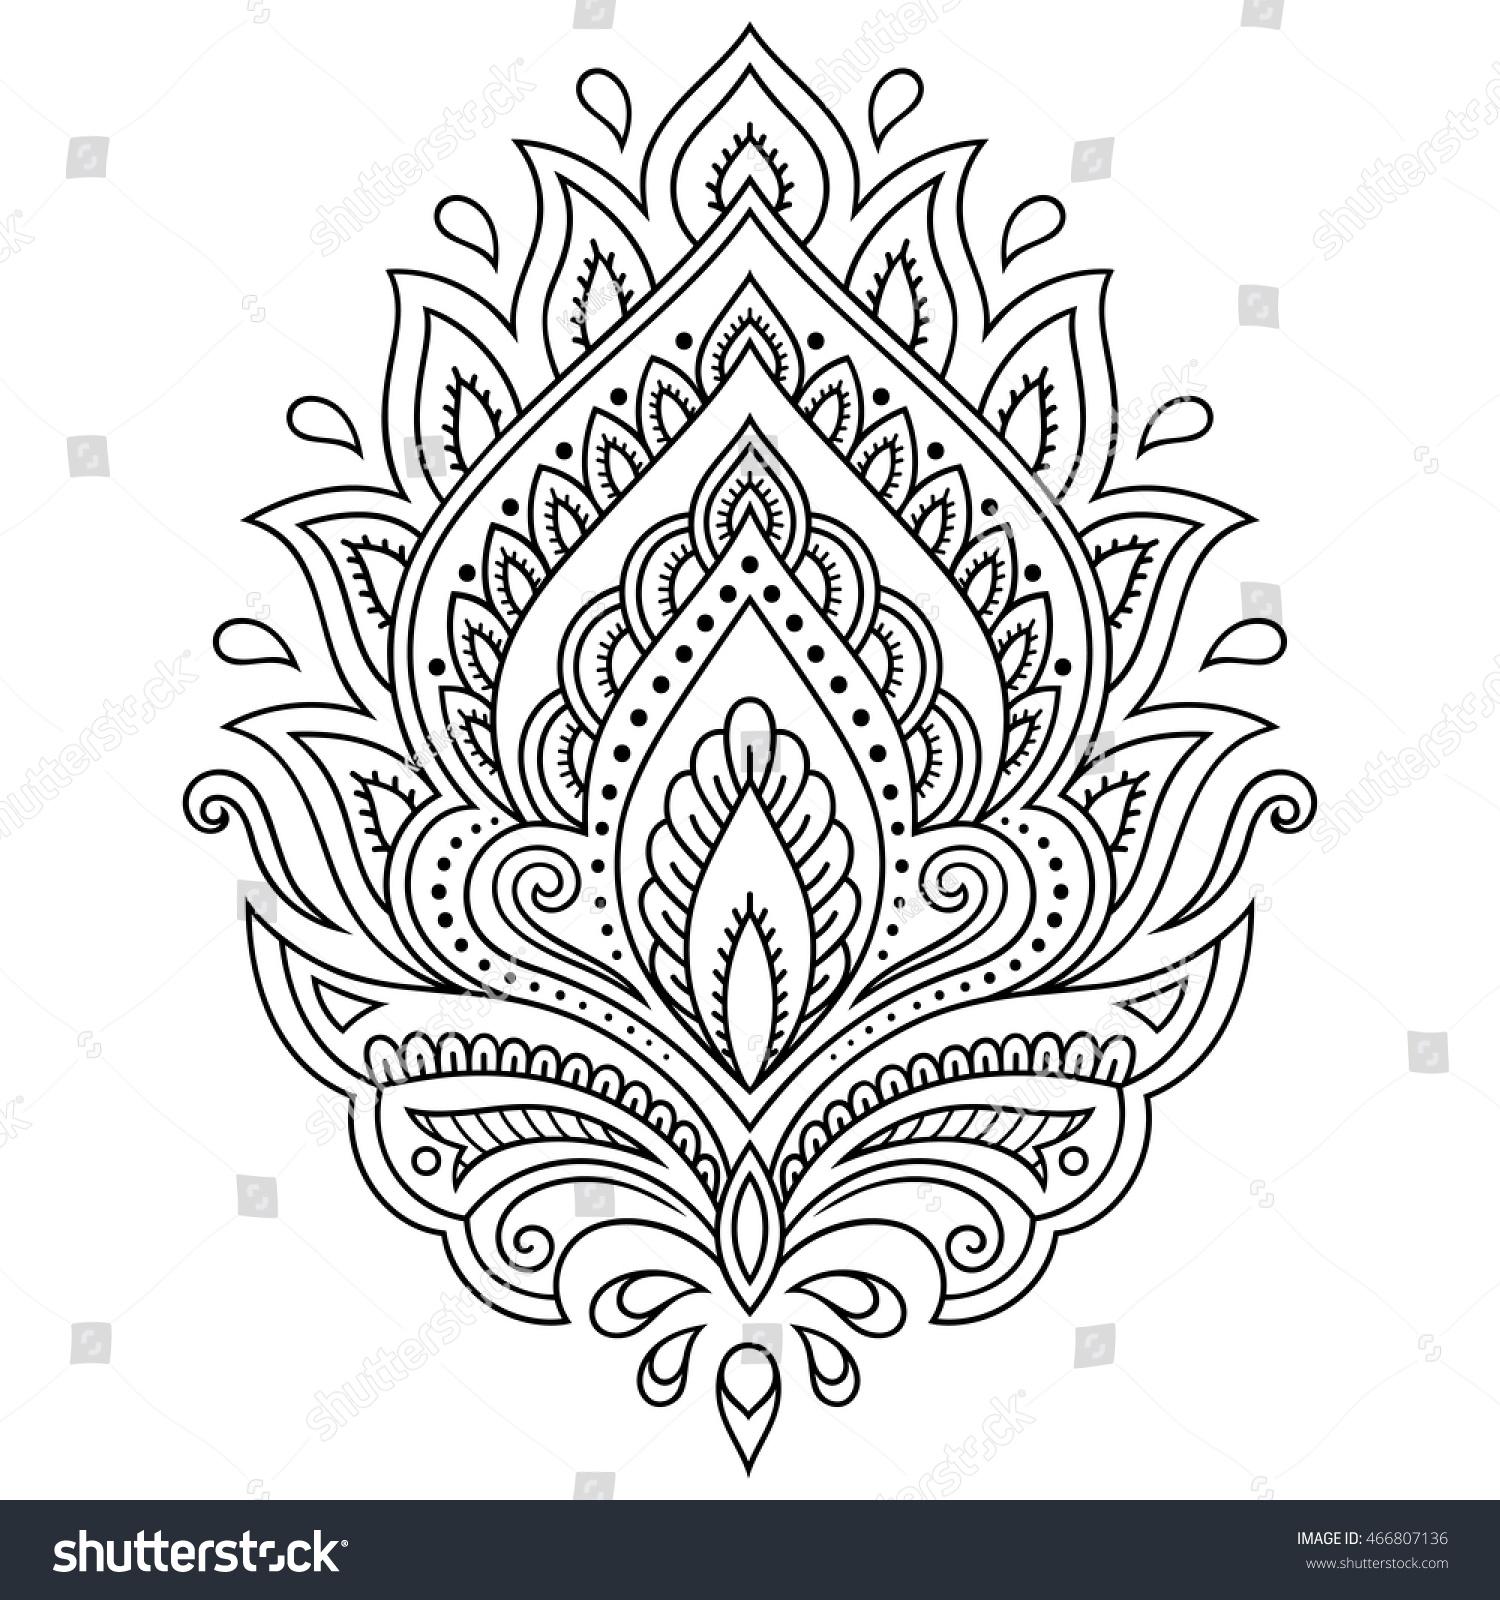 Mehndi lotus flower pattern henna drawing stock vector 466807136 mehndi lotus flower pattern for henna drawing and tattoo decoration in ethnic oriental indian izmirmasajfo